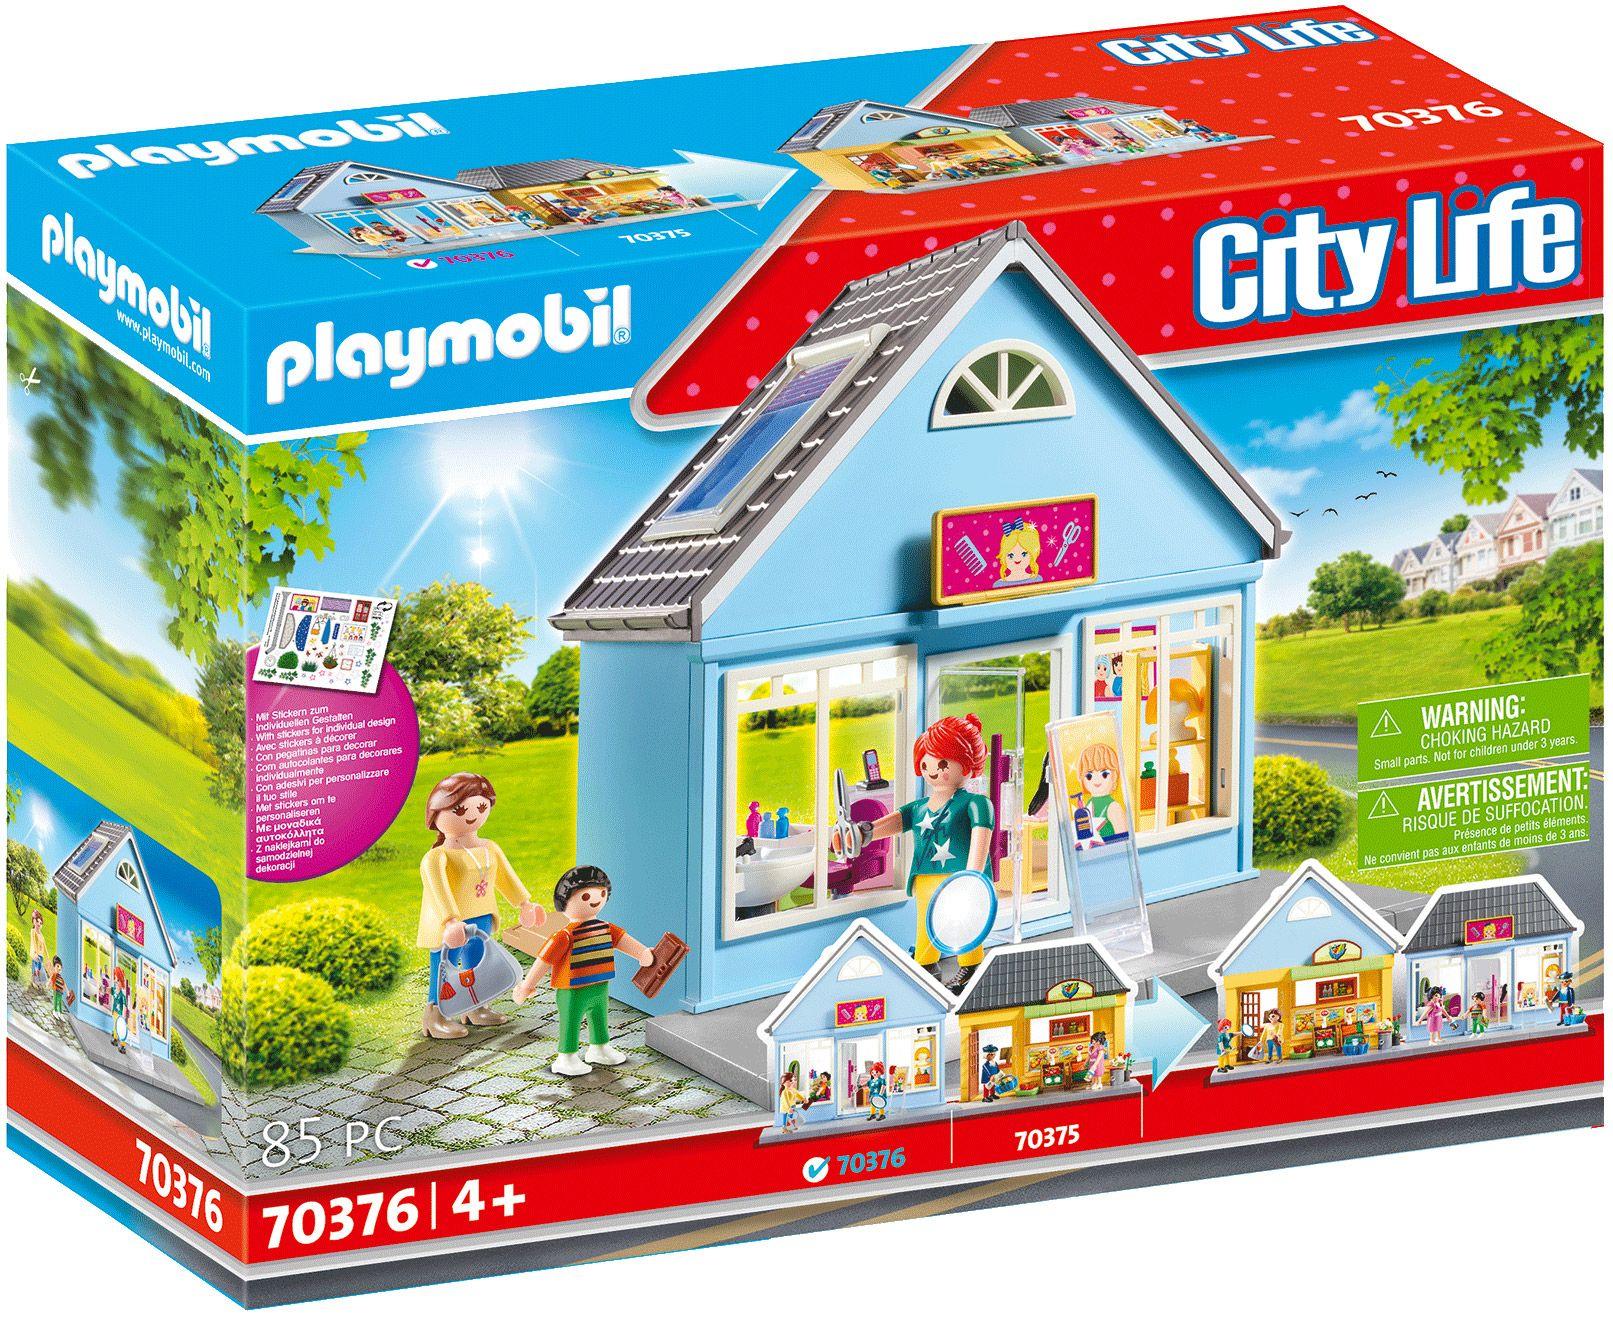 Calendrier De Lavent Playmobil 2021 PLAYMOBIL City Life 70376 : Salon de coiffure en 2020 | Playmobil